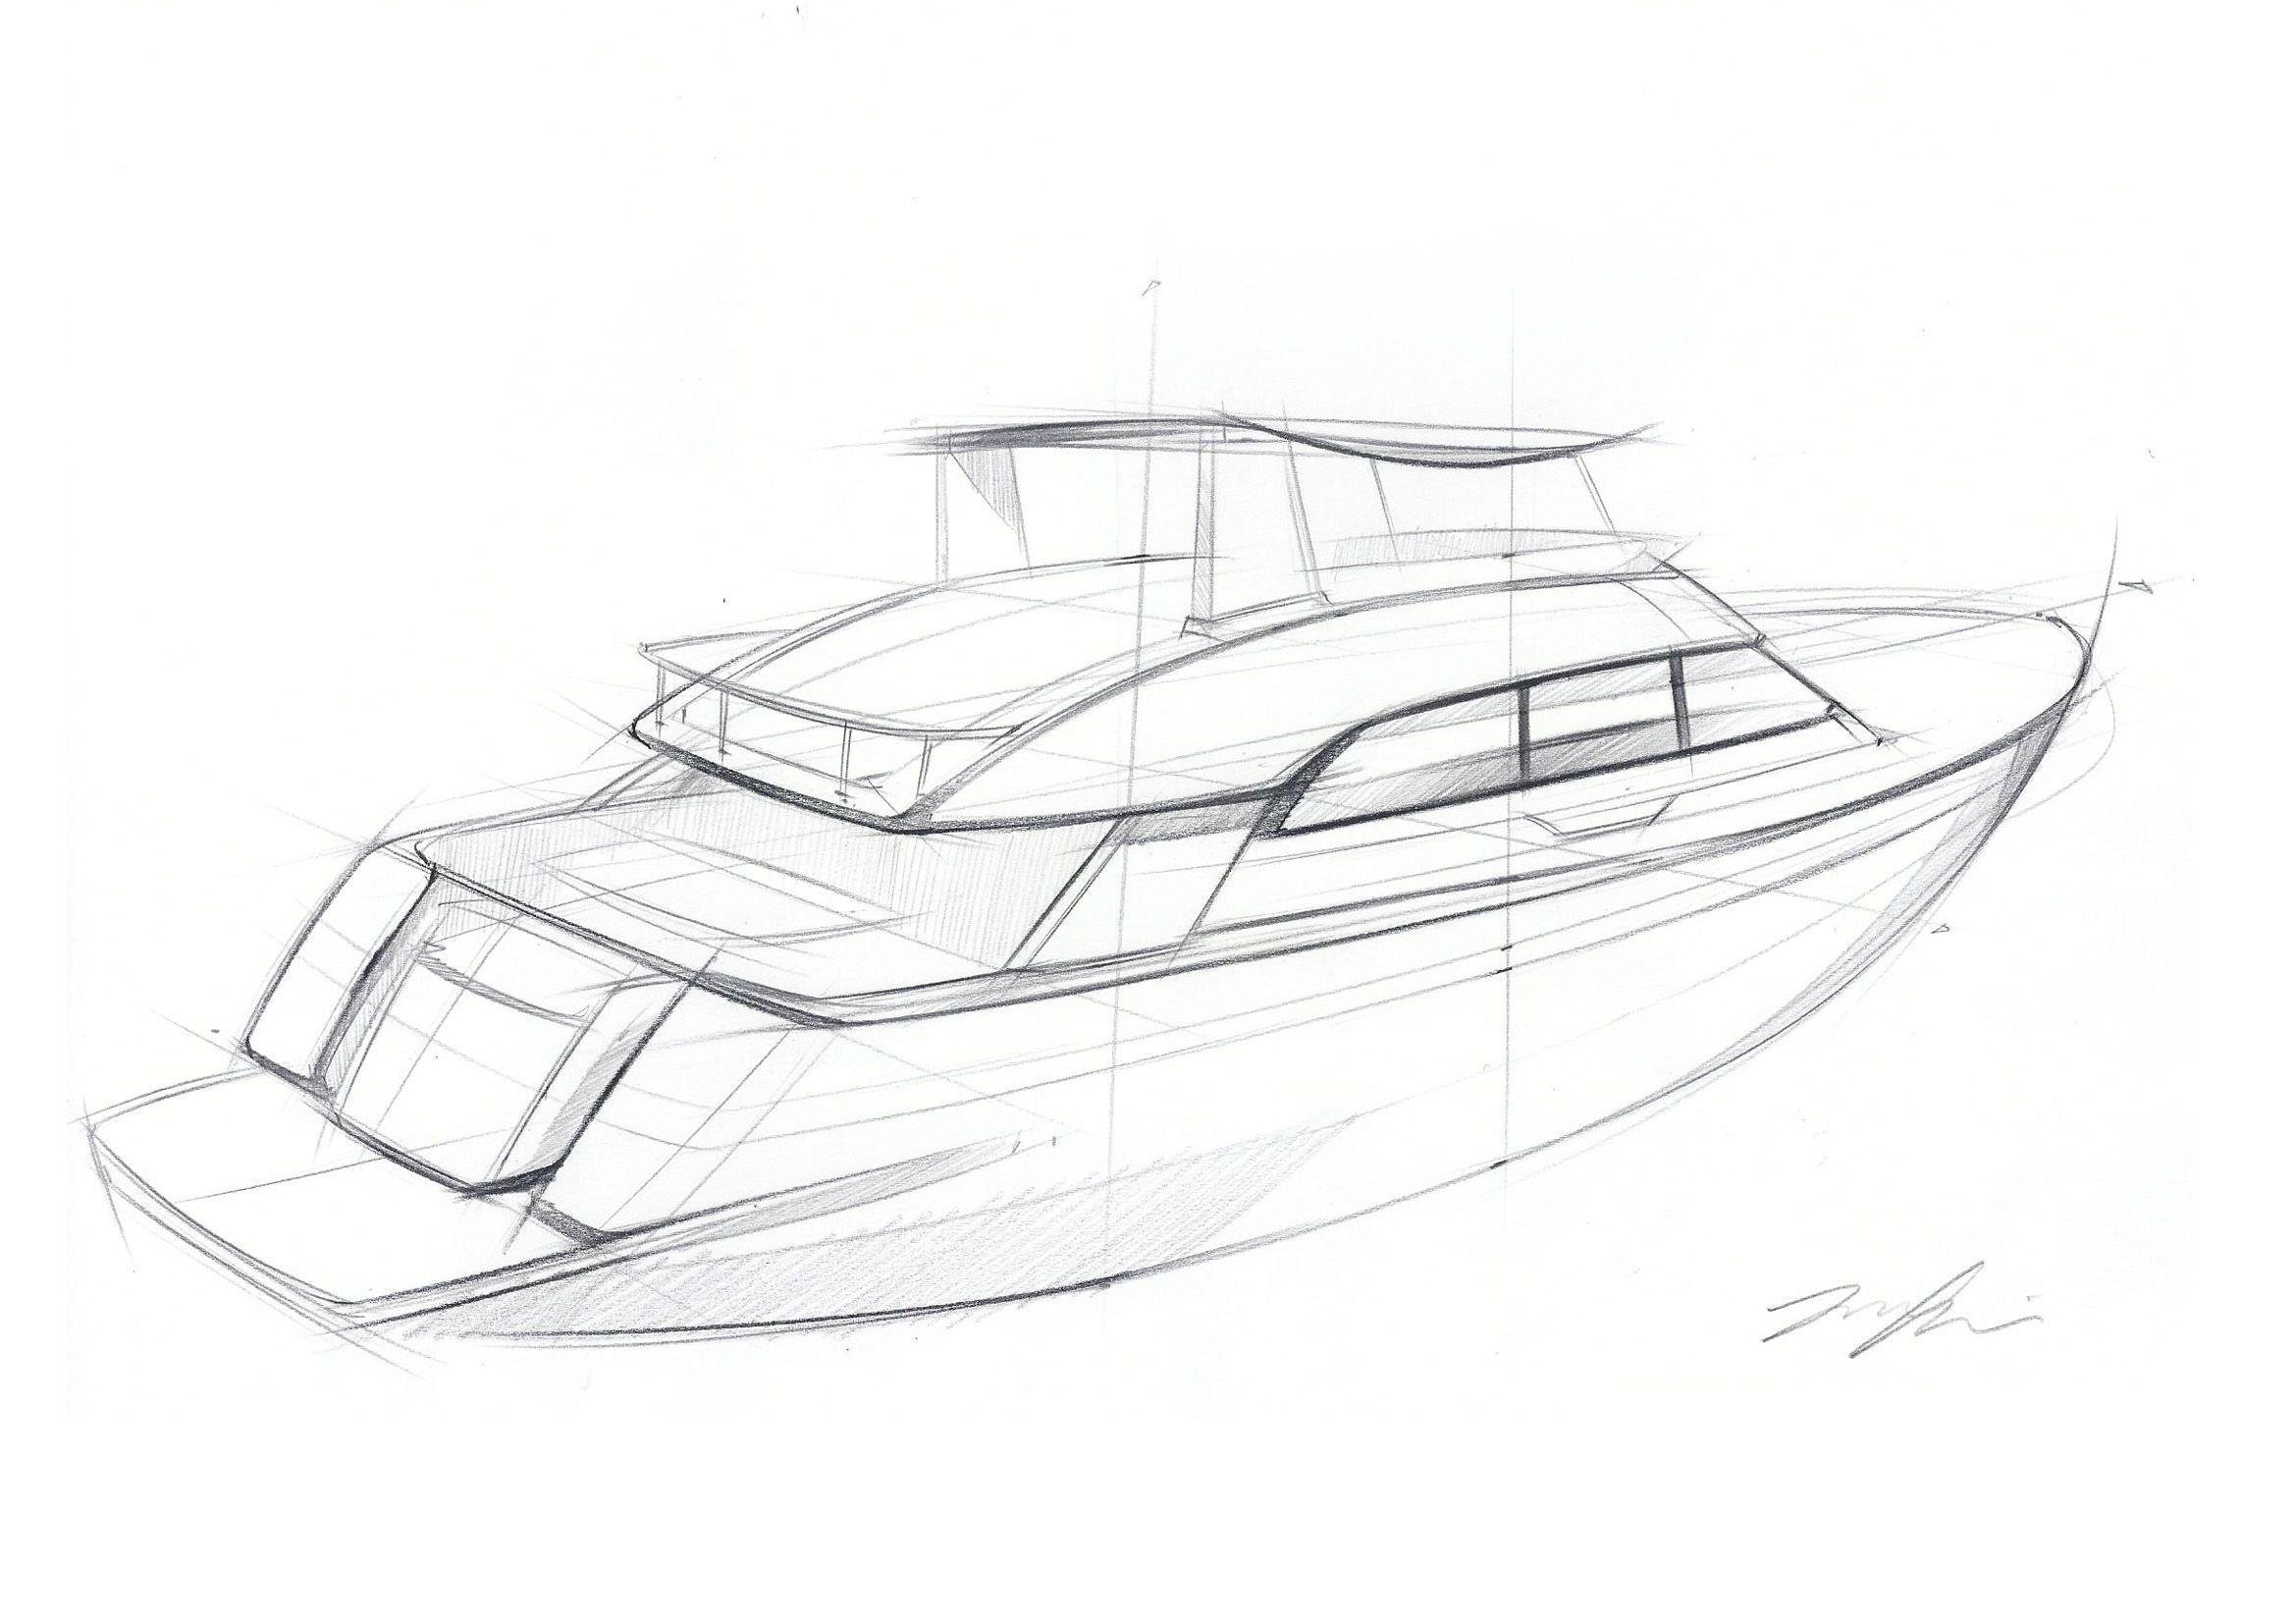 Yacht Sketch Ulasim Tasarimi Tekne Cizim Cizimler